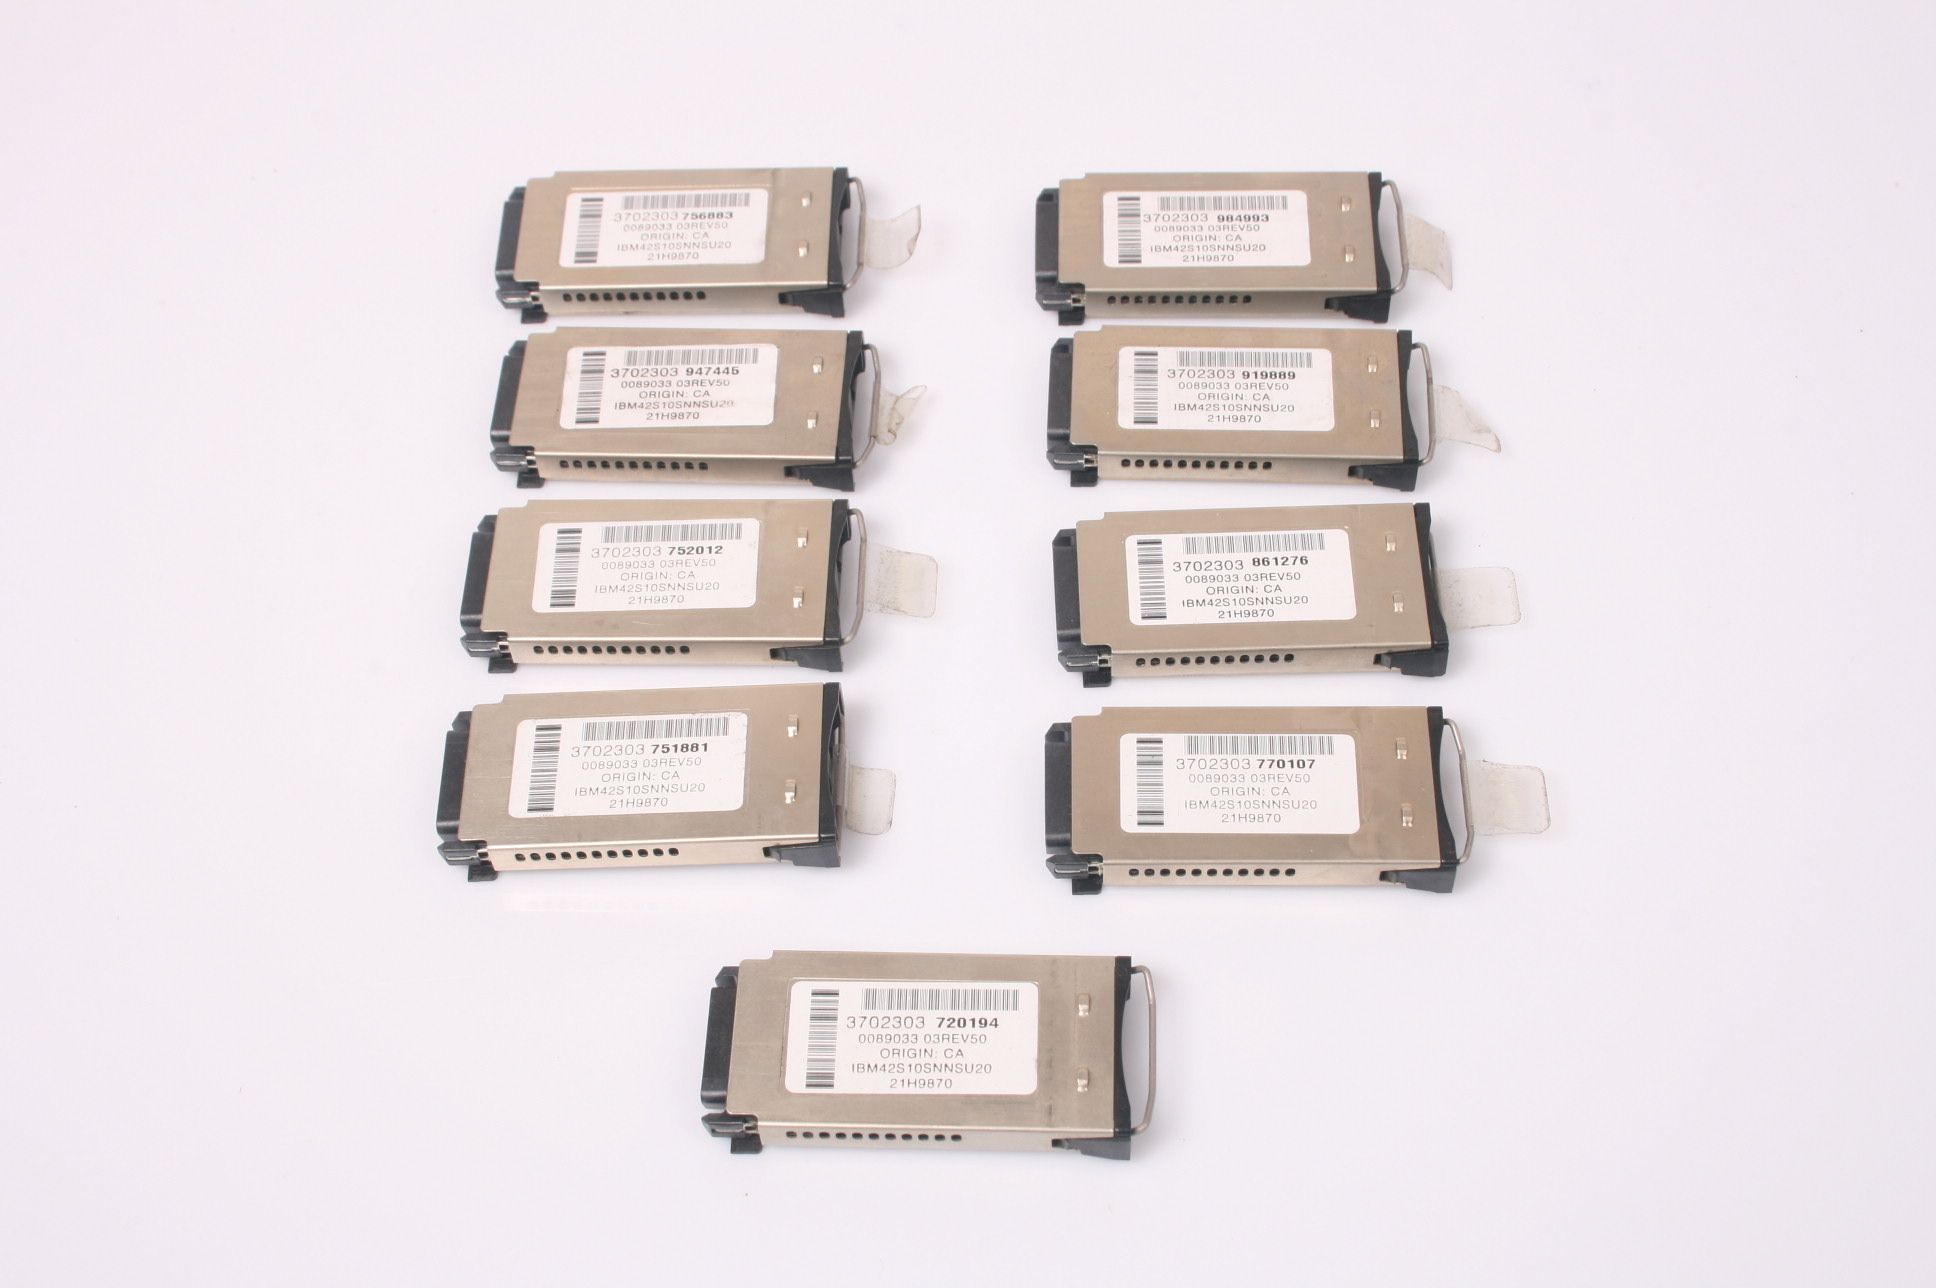 LOT OF 9 IBM Shortwave Optical Fiber Channel FC Converter Module Adapter 21H9870 3702303